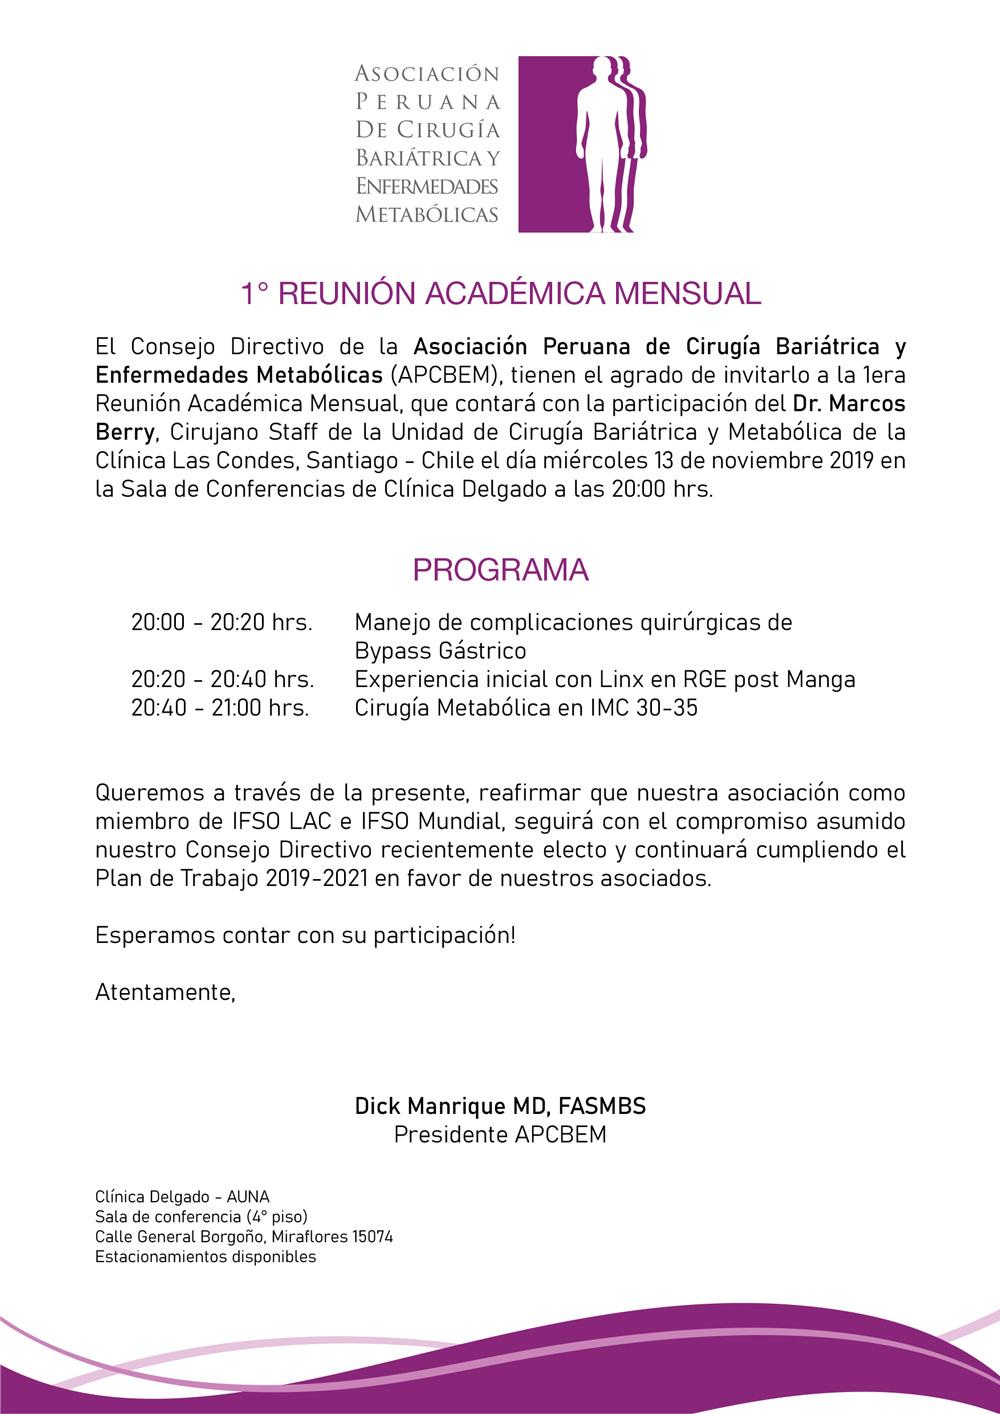 1er Reunión Académica Mensual